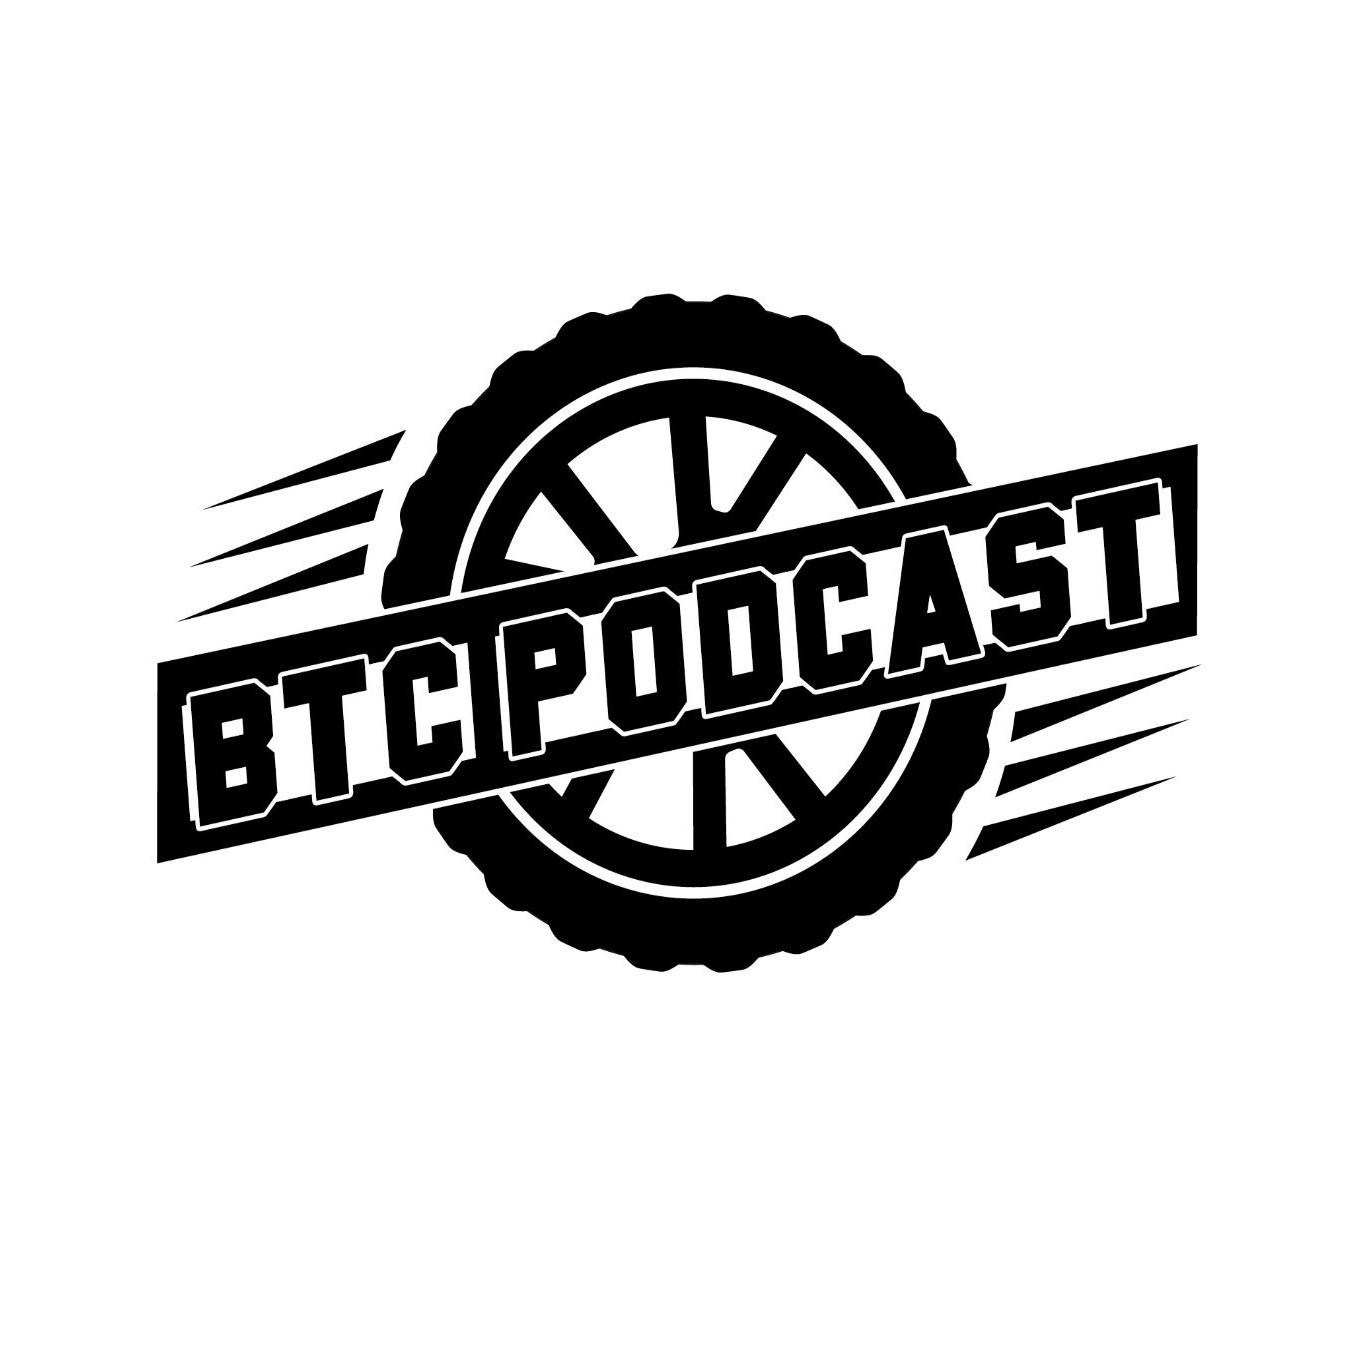 BTCP British Touring Car Podcast